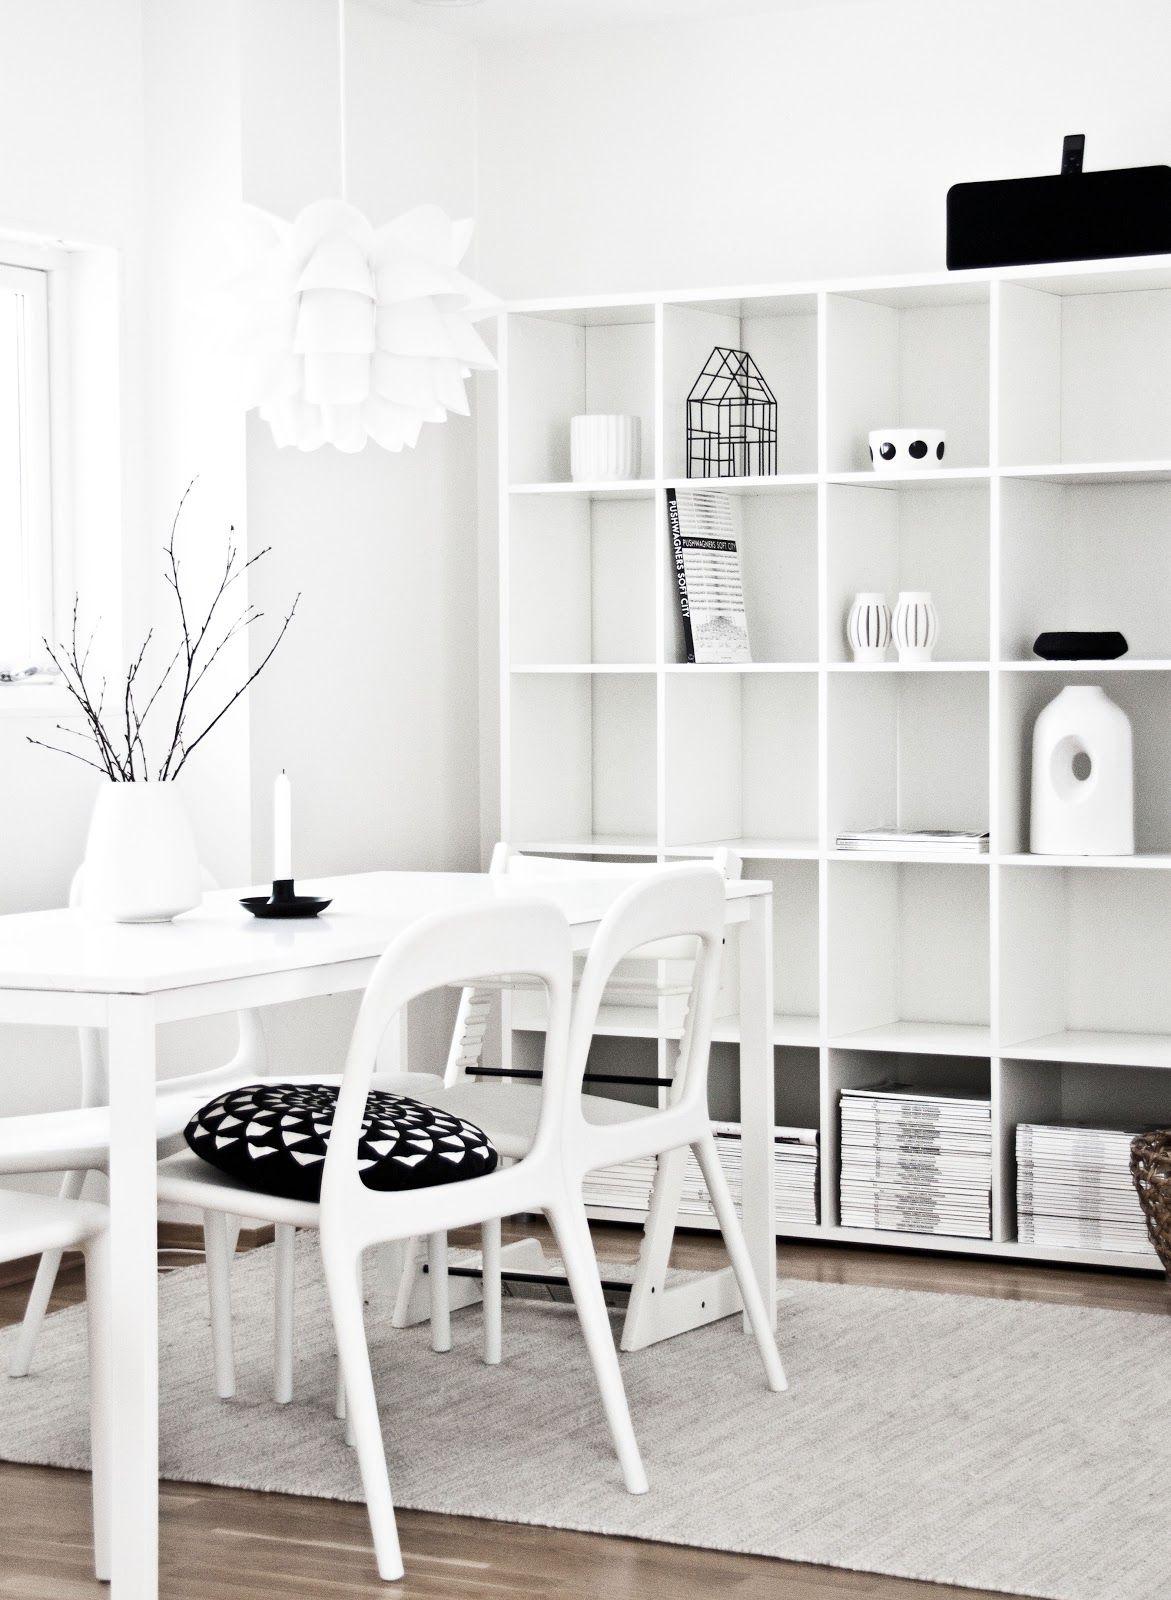 Ikea Urban chair with cushion Interior design dining